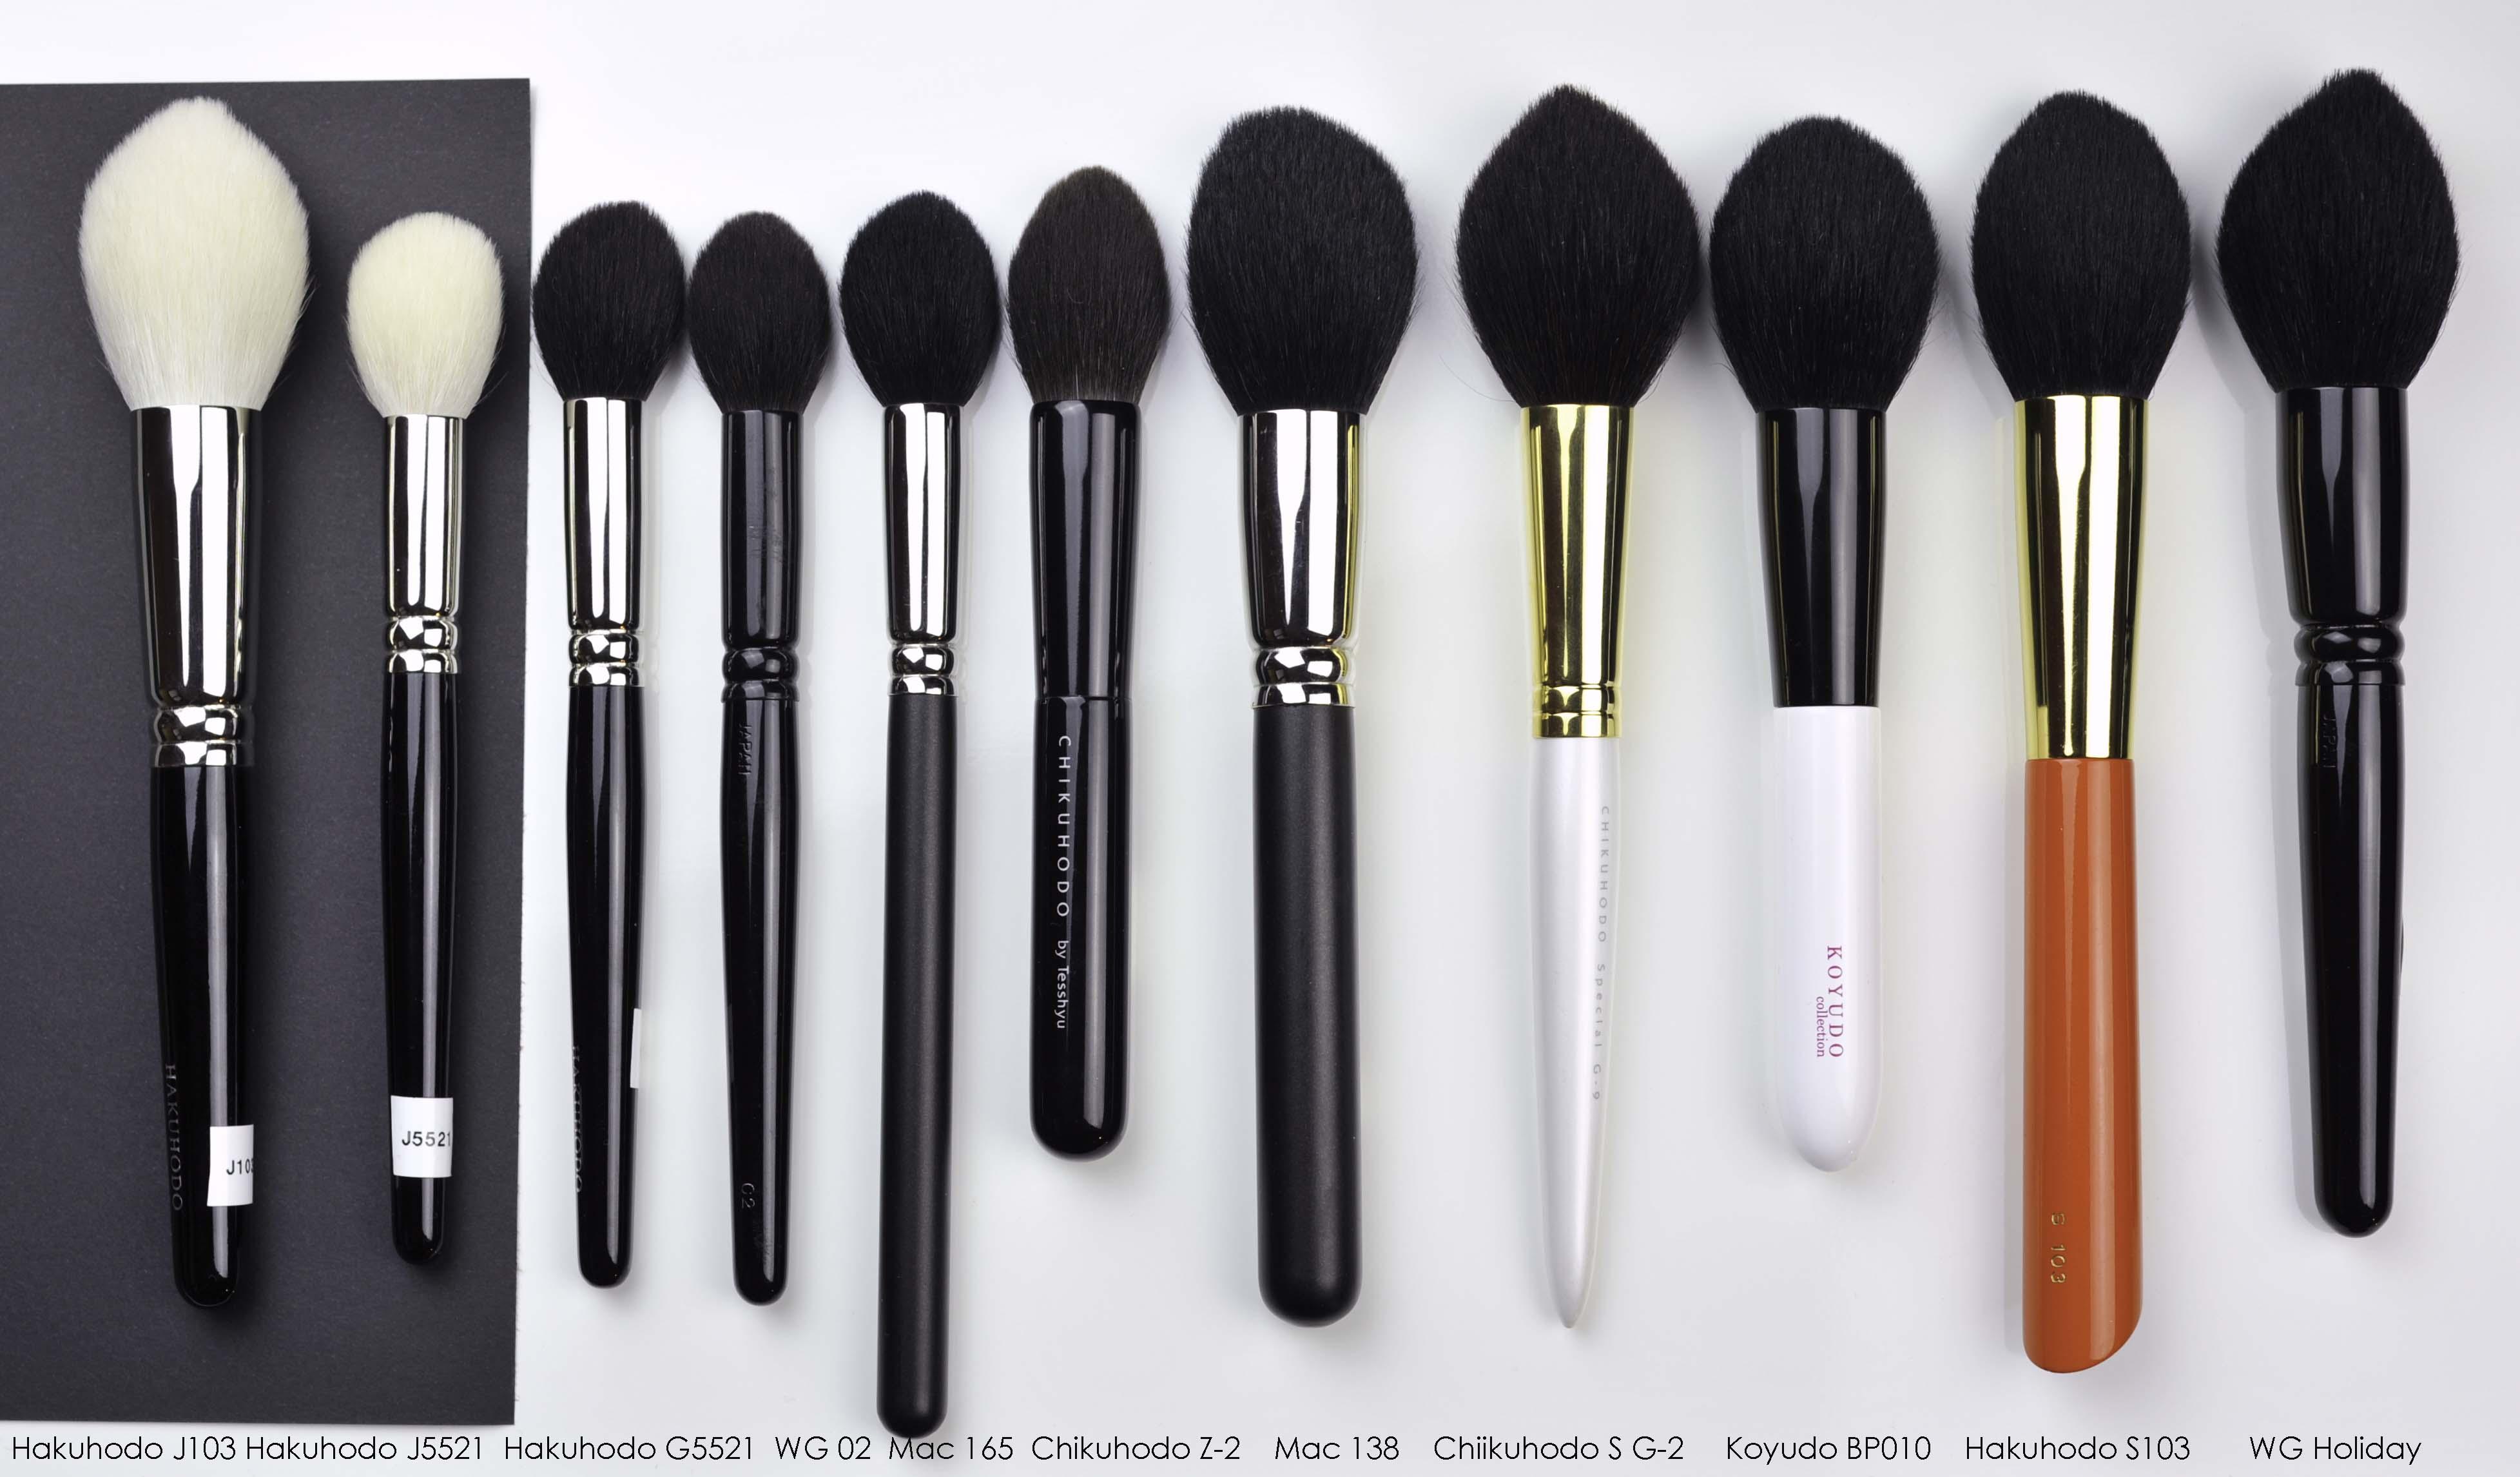 Koyudo BP010 with some similar shaped brushes – Sweet Makeup